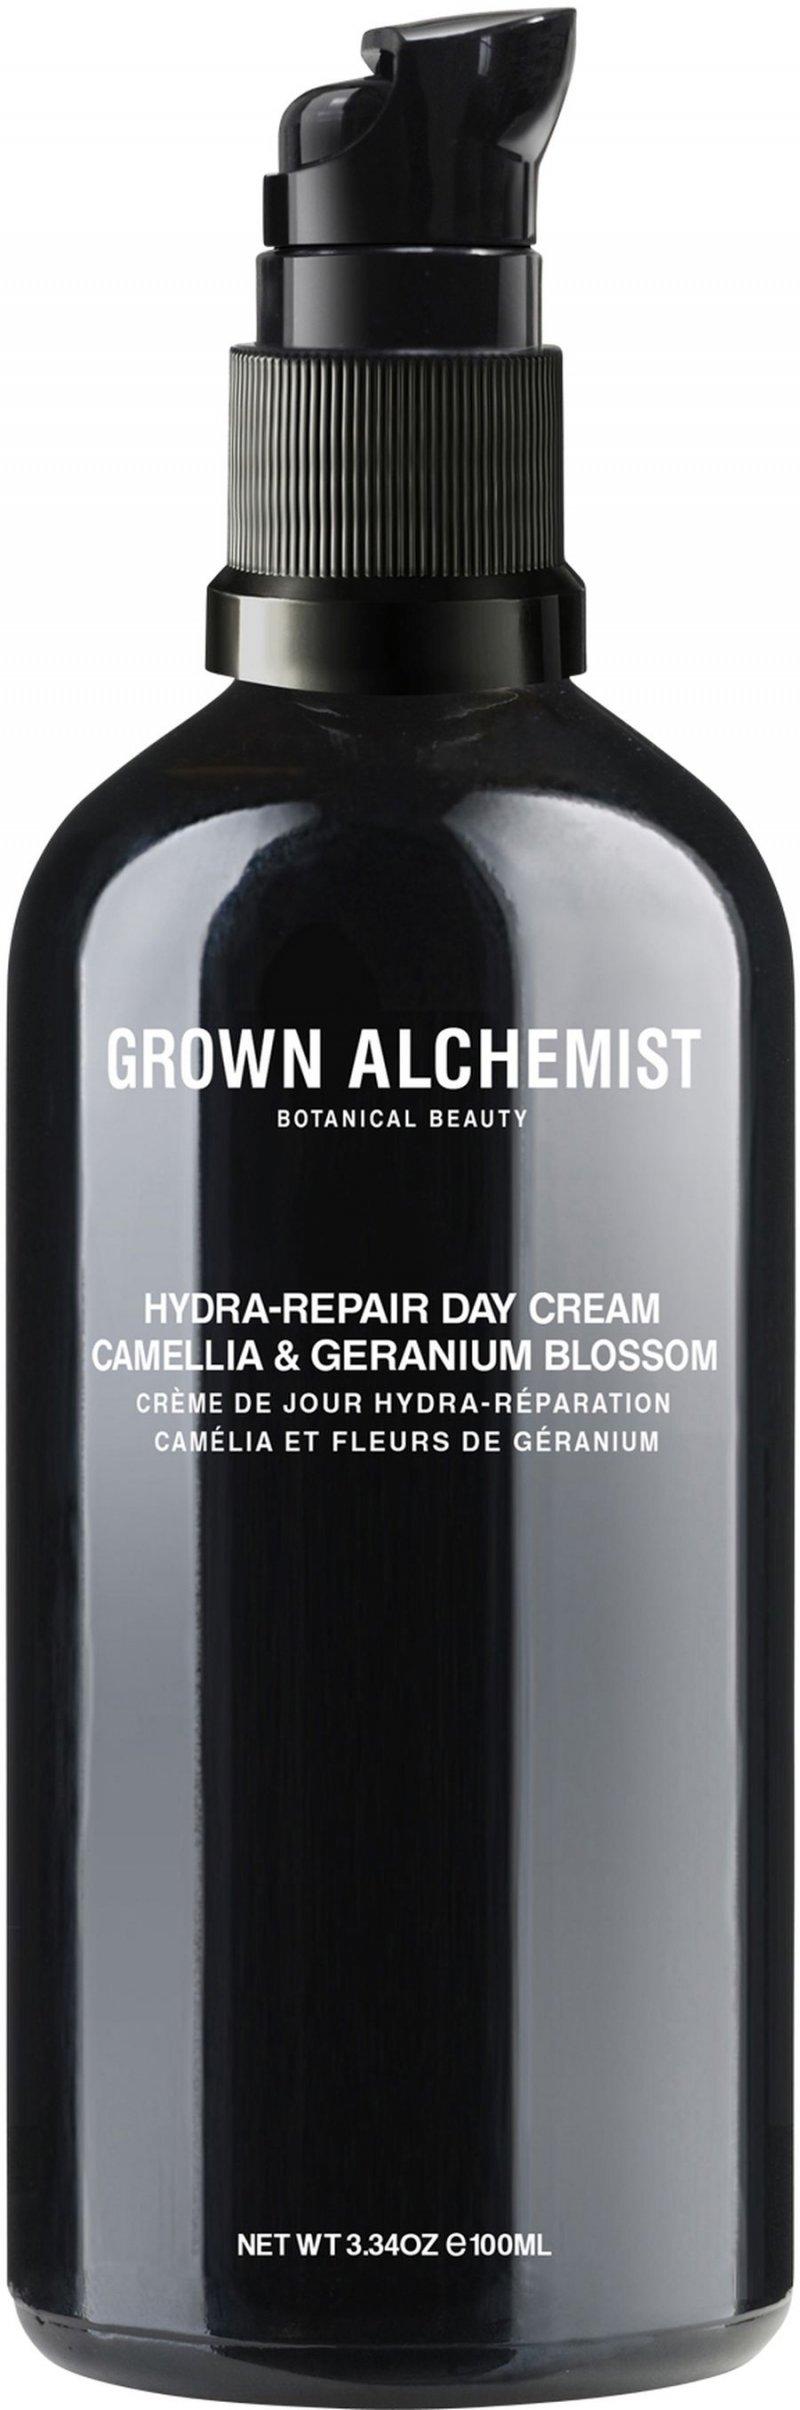 Image of   Grown Alchemist Ansigtscreme - Hydra-repair Day Cream: Camellia & Geranium Blossom 100 Ml